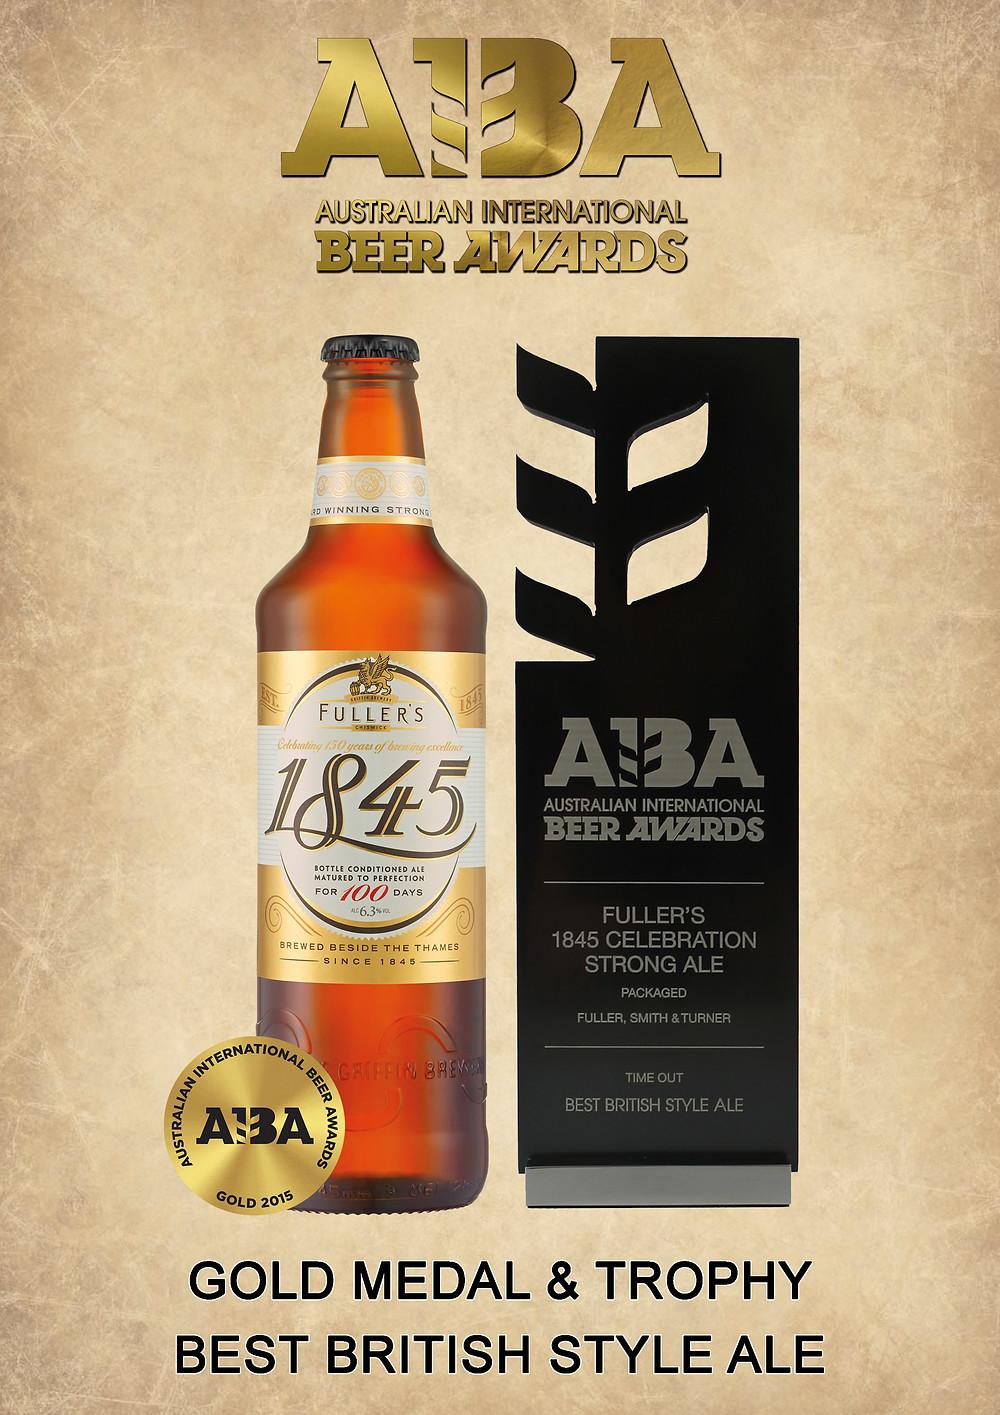 AIBA Best British Style Ale Flyer 150609.jpg